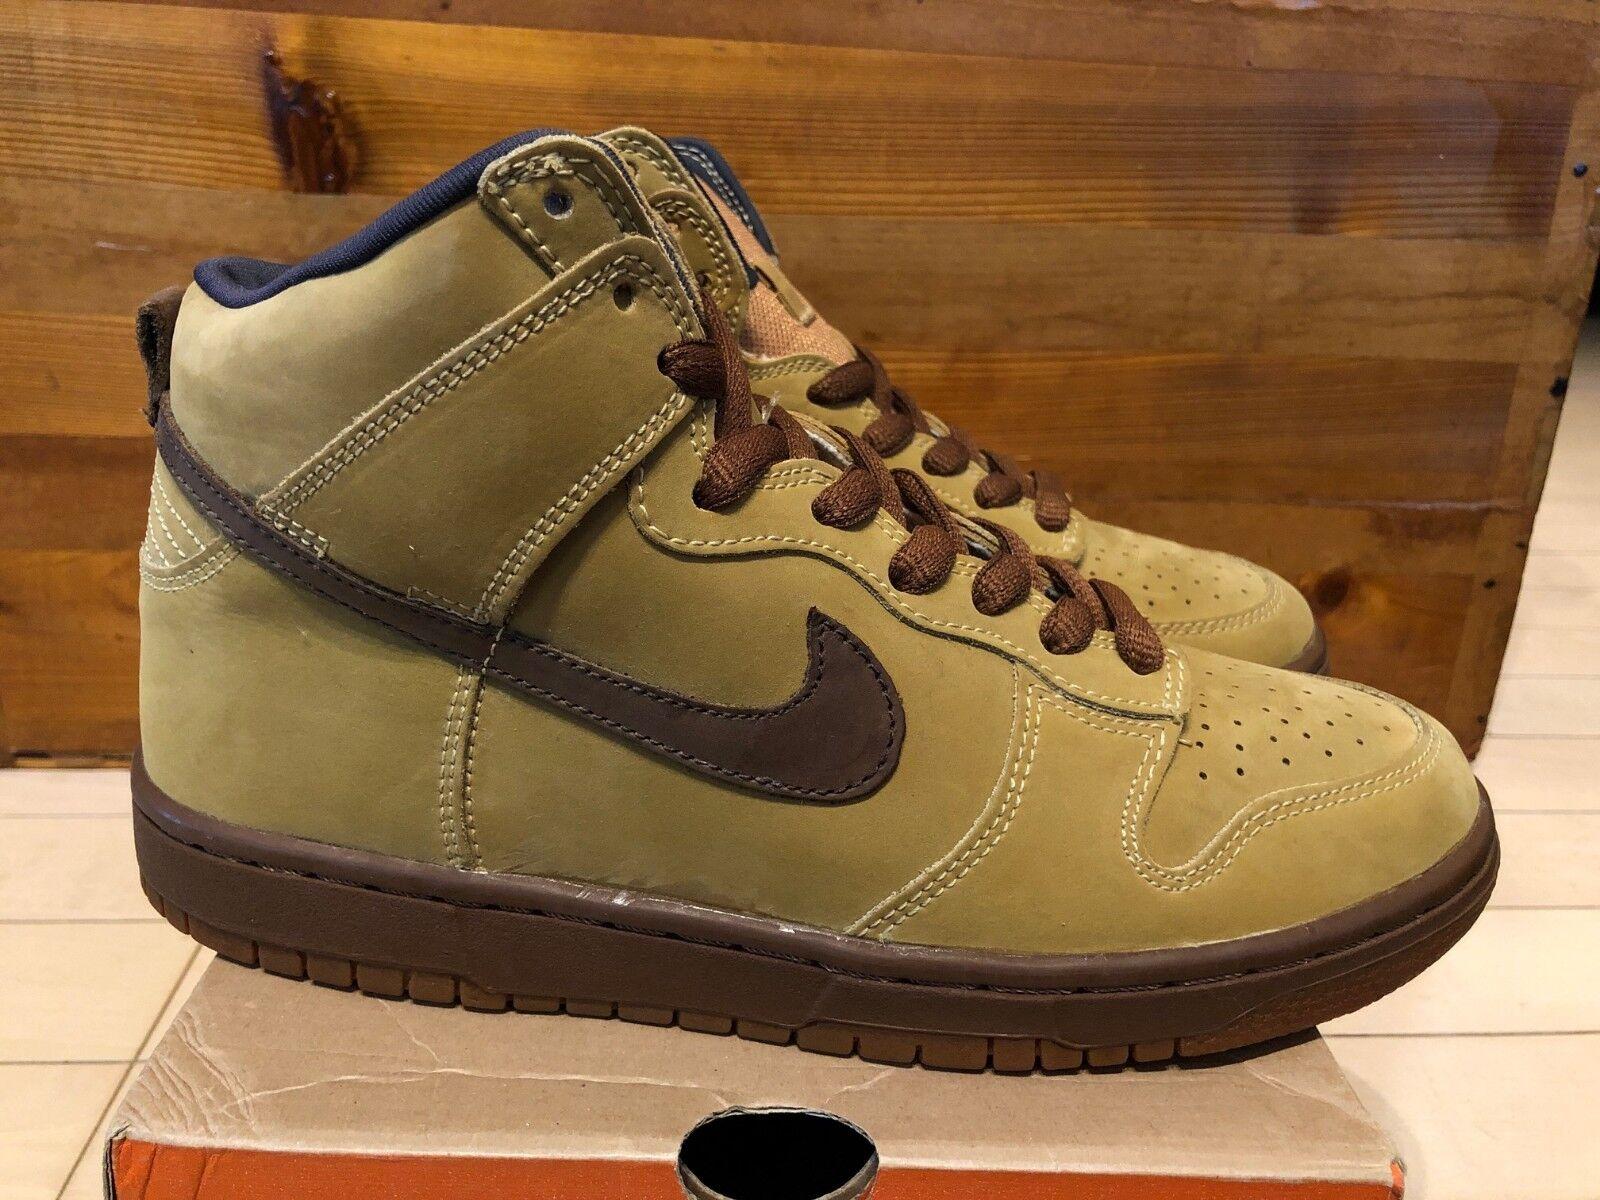 2002 Nike Dunk Hi Pro SB Maple Brown Wheat Bison size 7.5